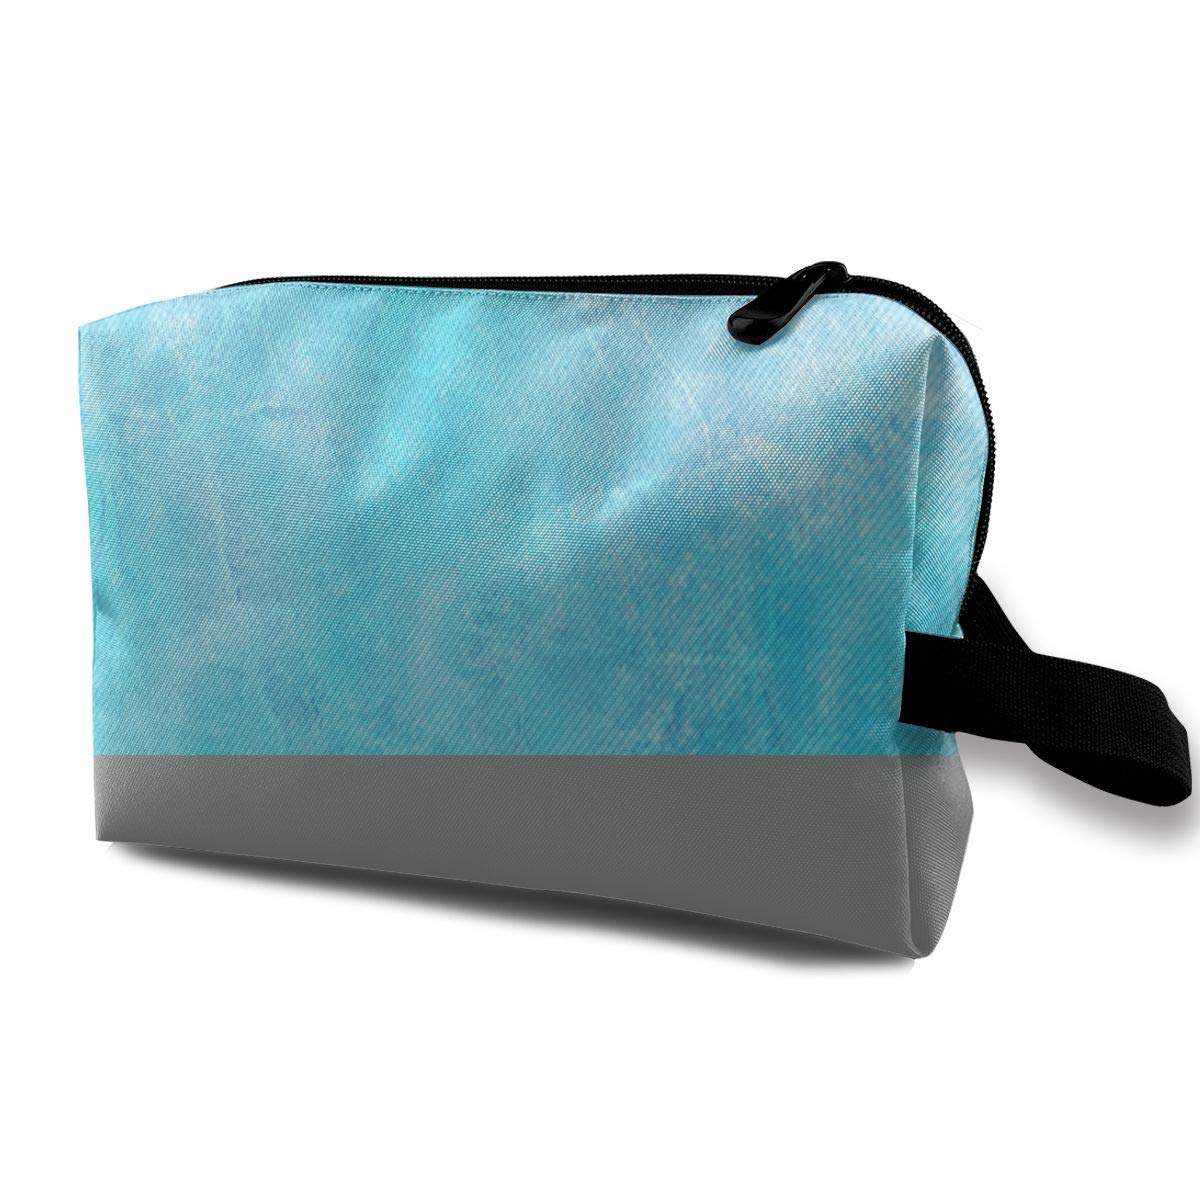 c9b1ba51de5 Com Makeup Bag Tiffany Blue Glitter Portable Travel Multifunction Bags  Vintage Case For Girls Beauty